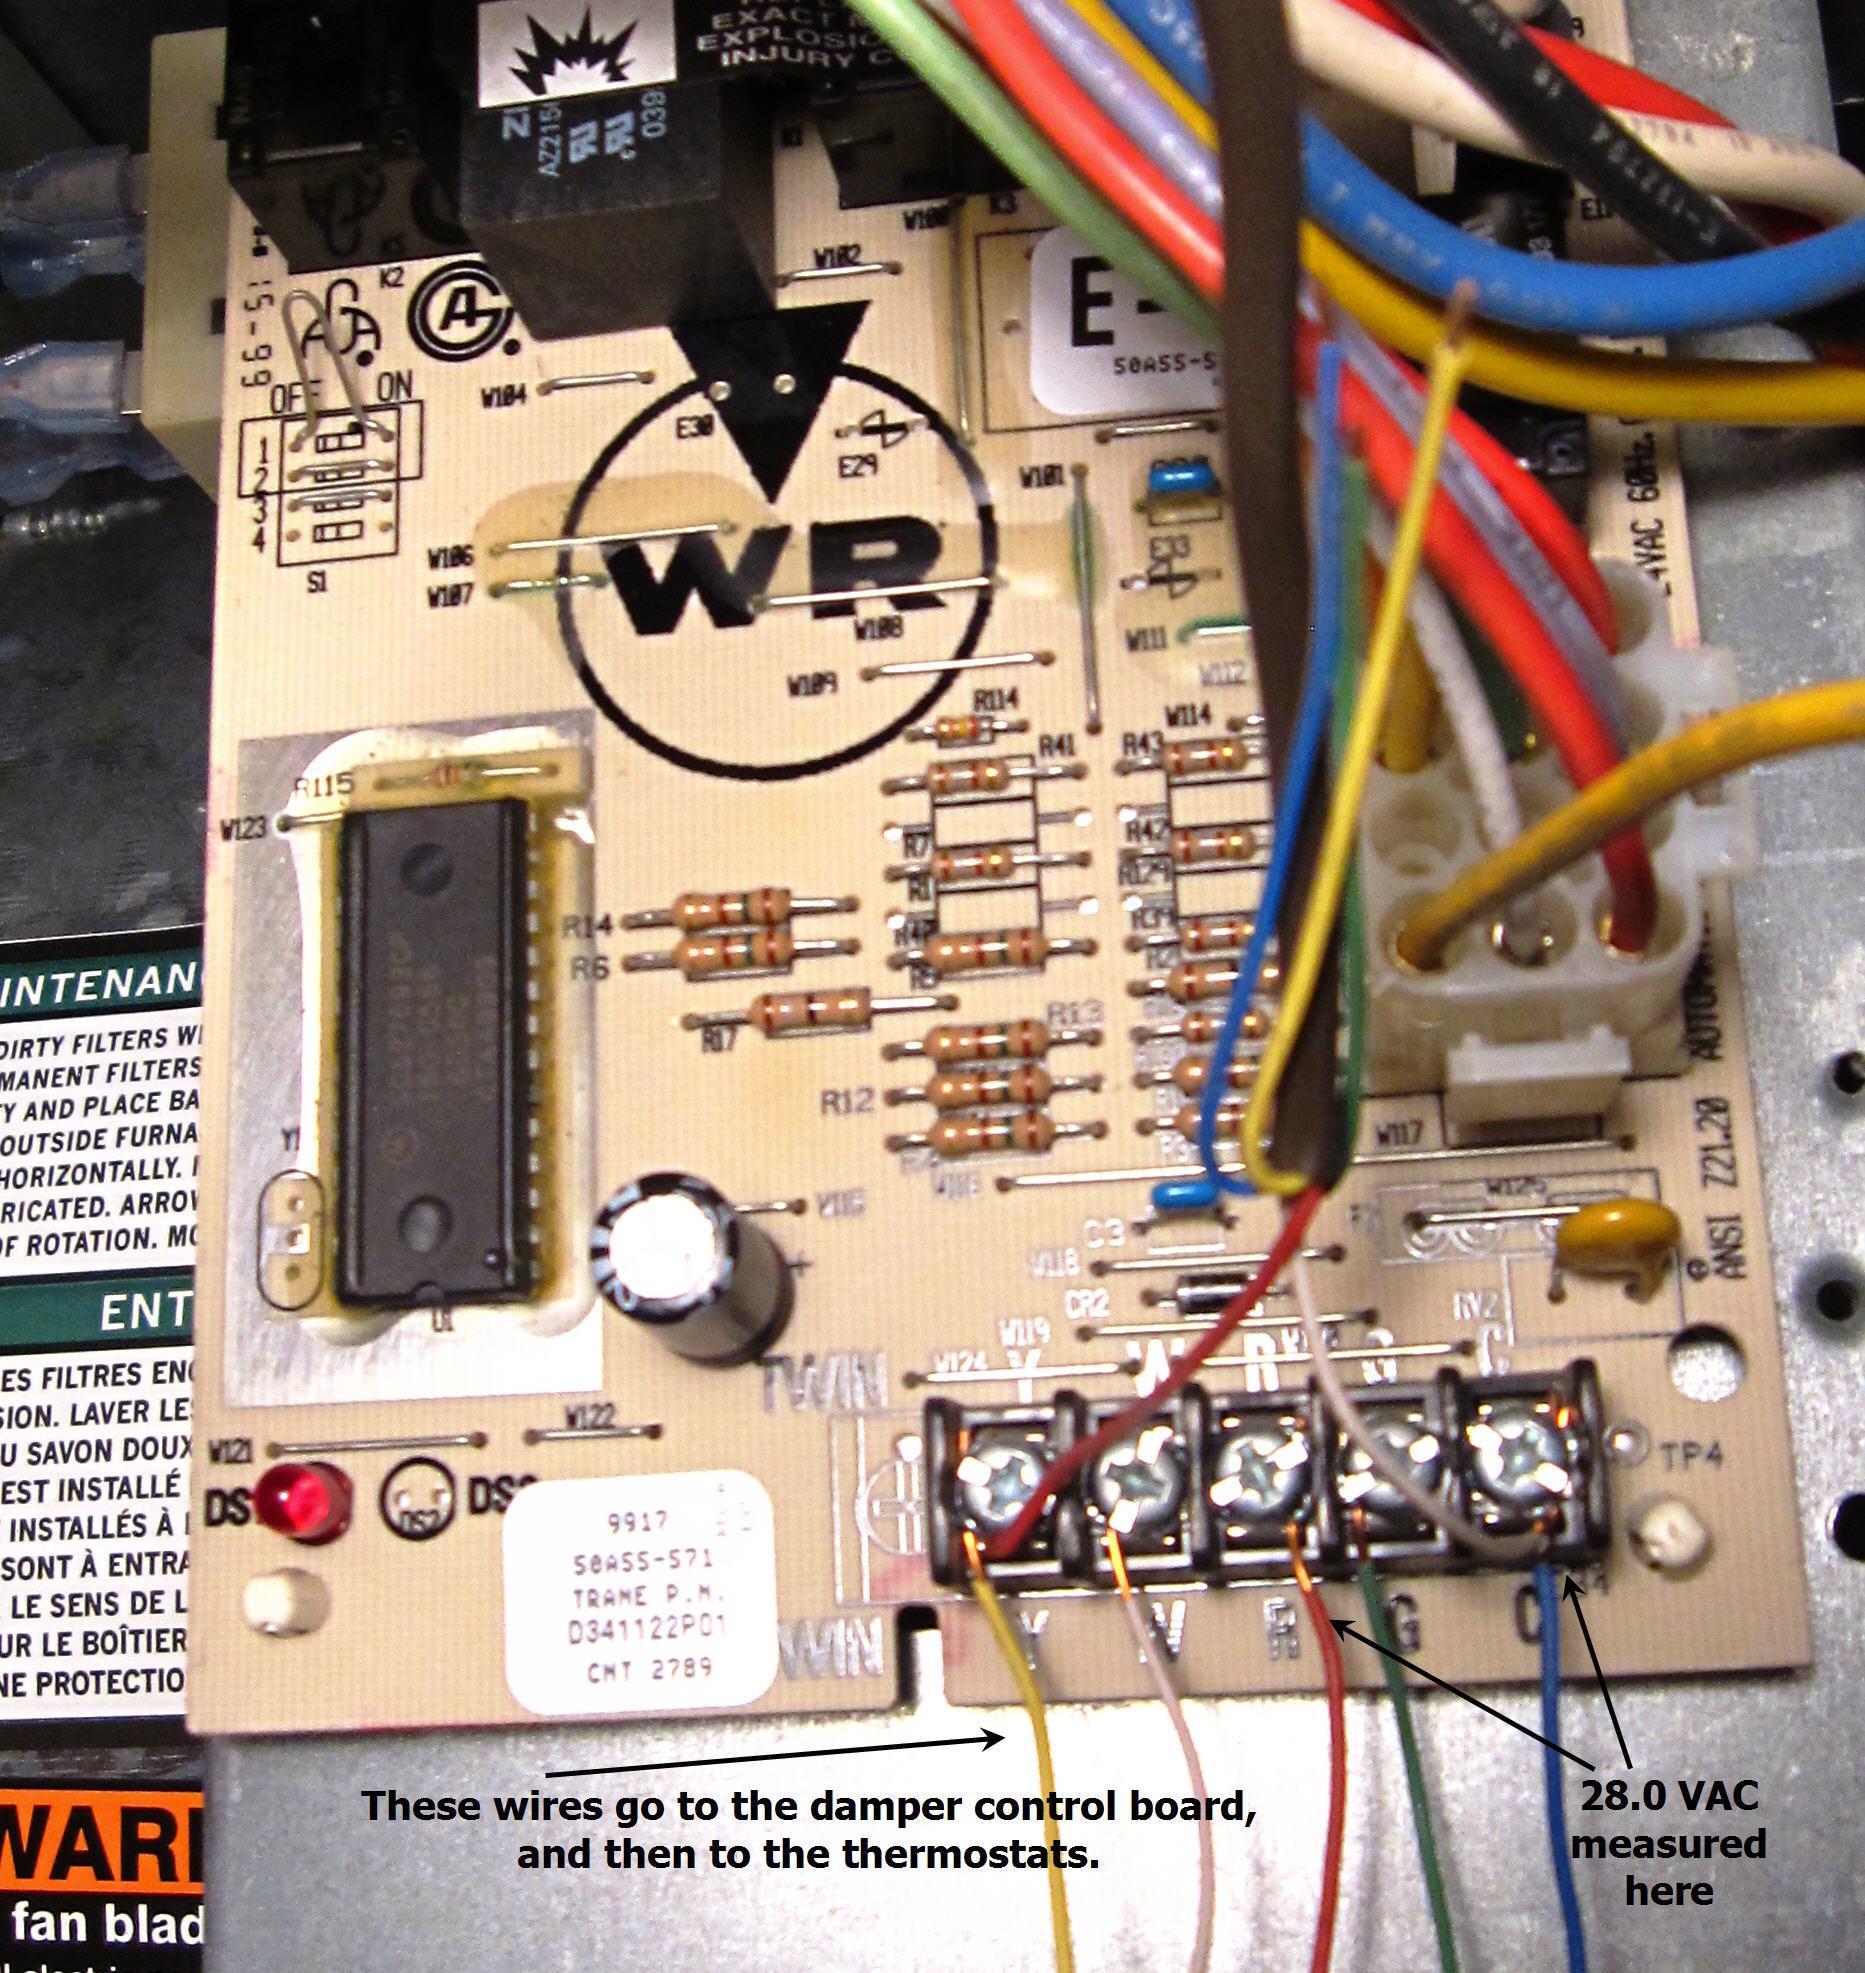 Furnace Control Board Wiring Diagram - 2003 Ford F150 Fuse Diagram -  stereoa.yenpancane.jeanjaures37.fr | Hvac Control Board Wiring |  | Wiring Diagram Resource